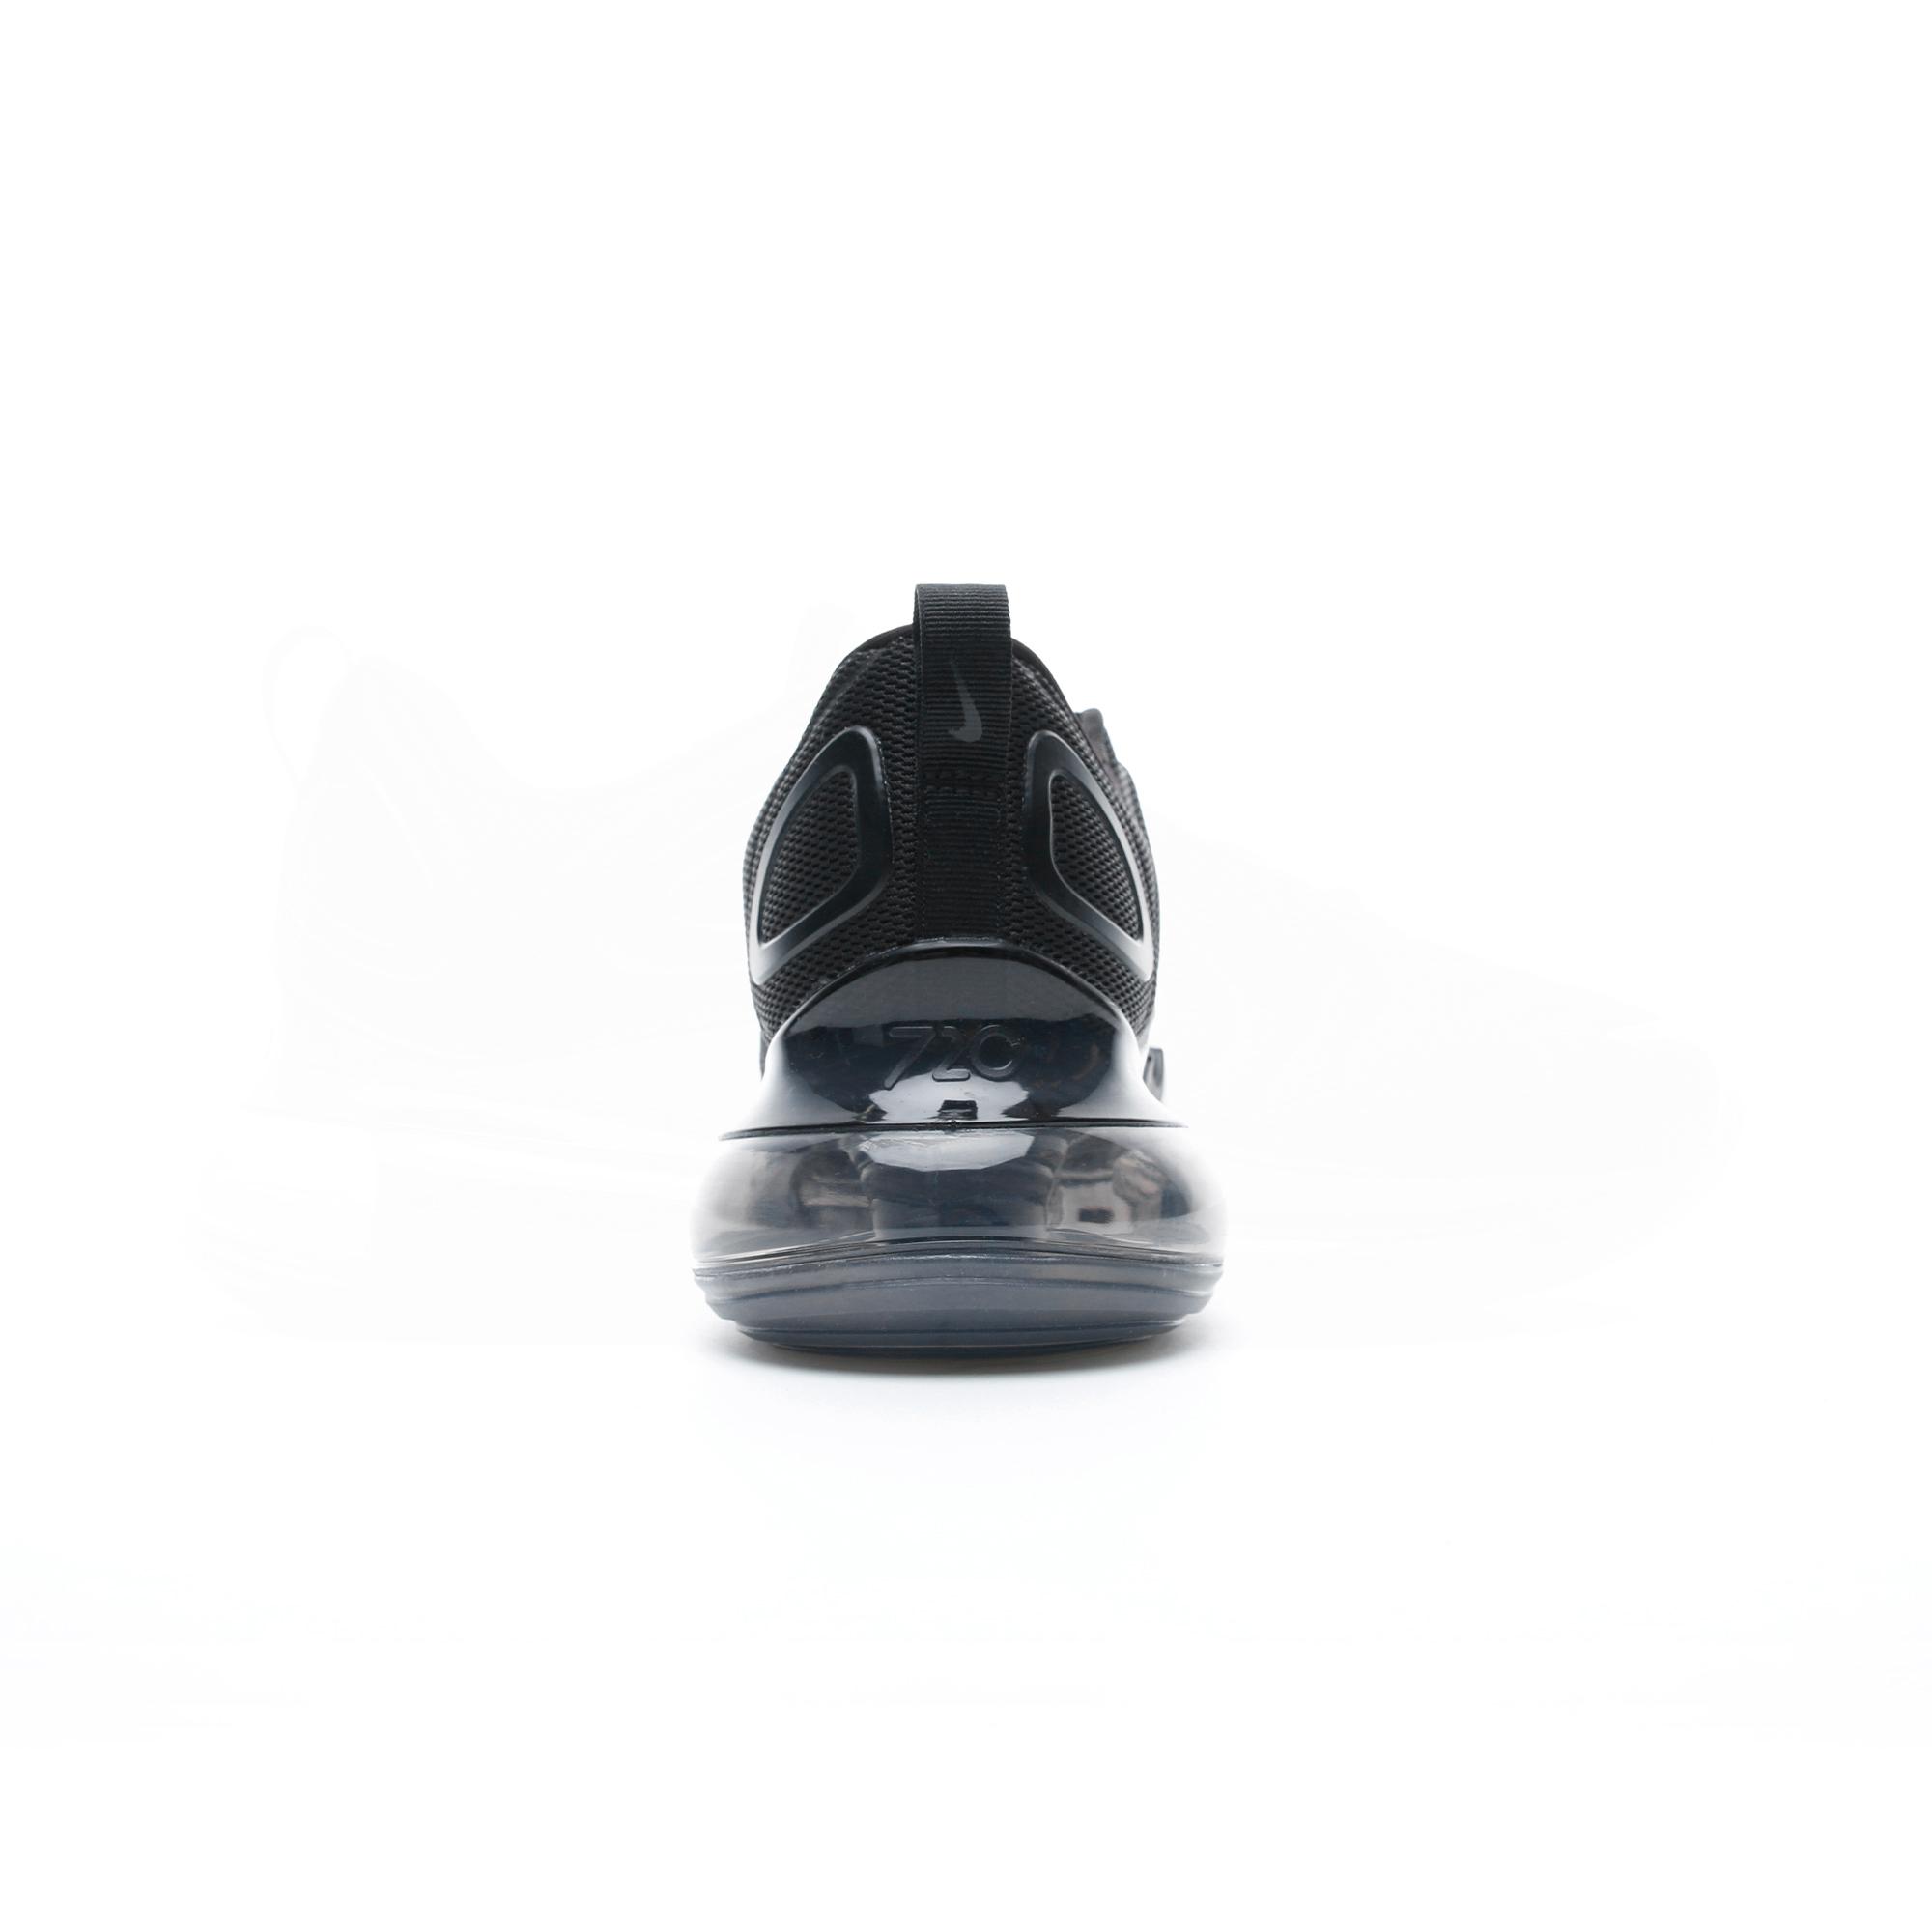 Nike Air Max 720 Siyah Erkek Spor Ayakkabı